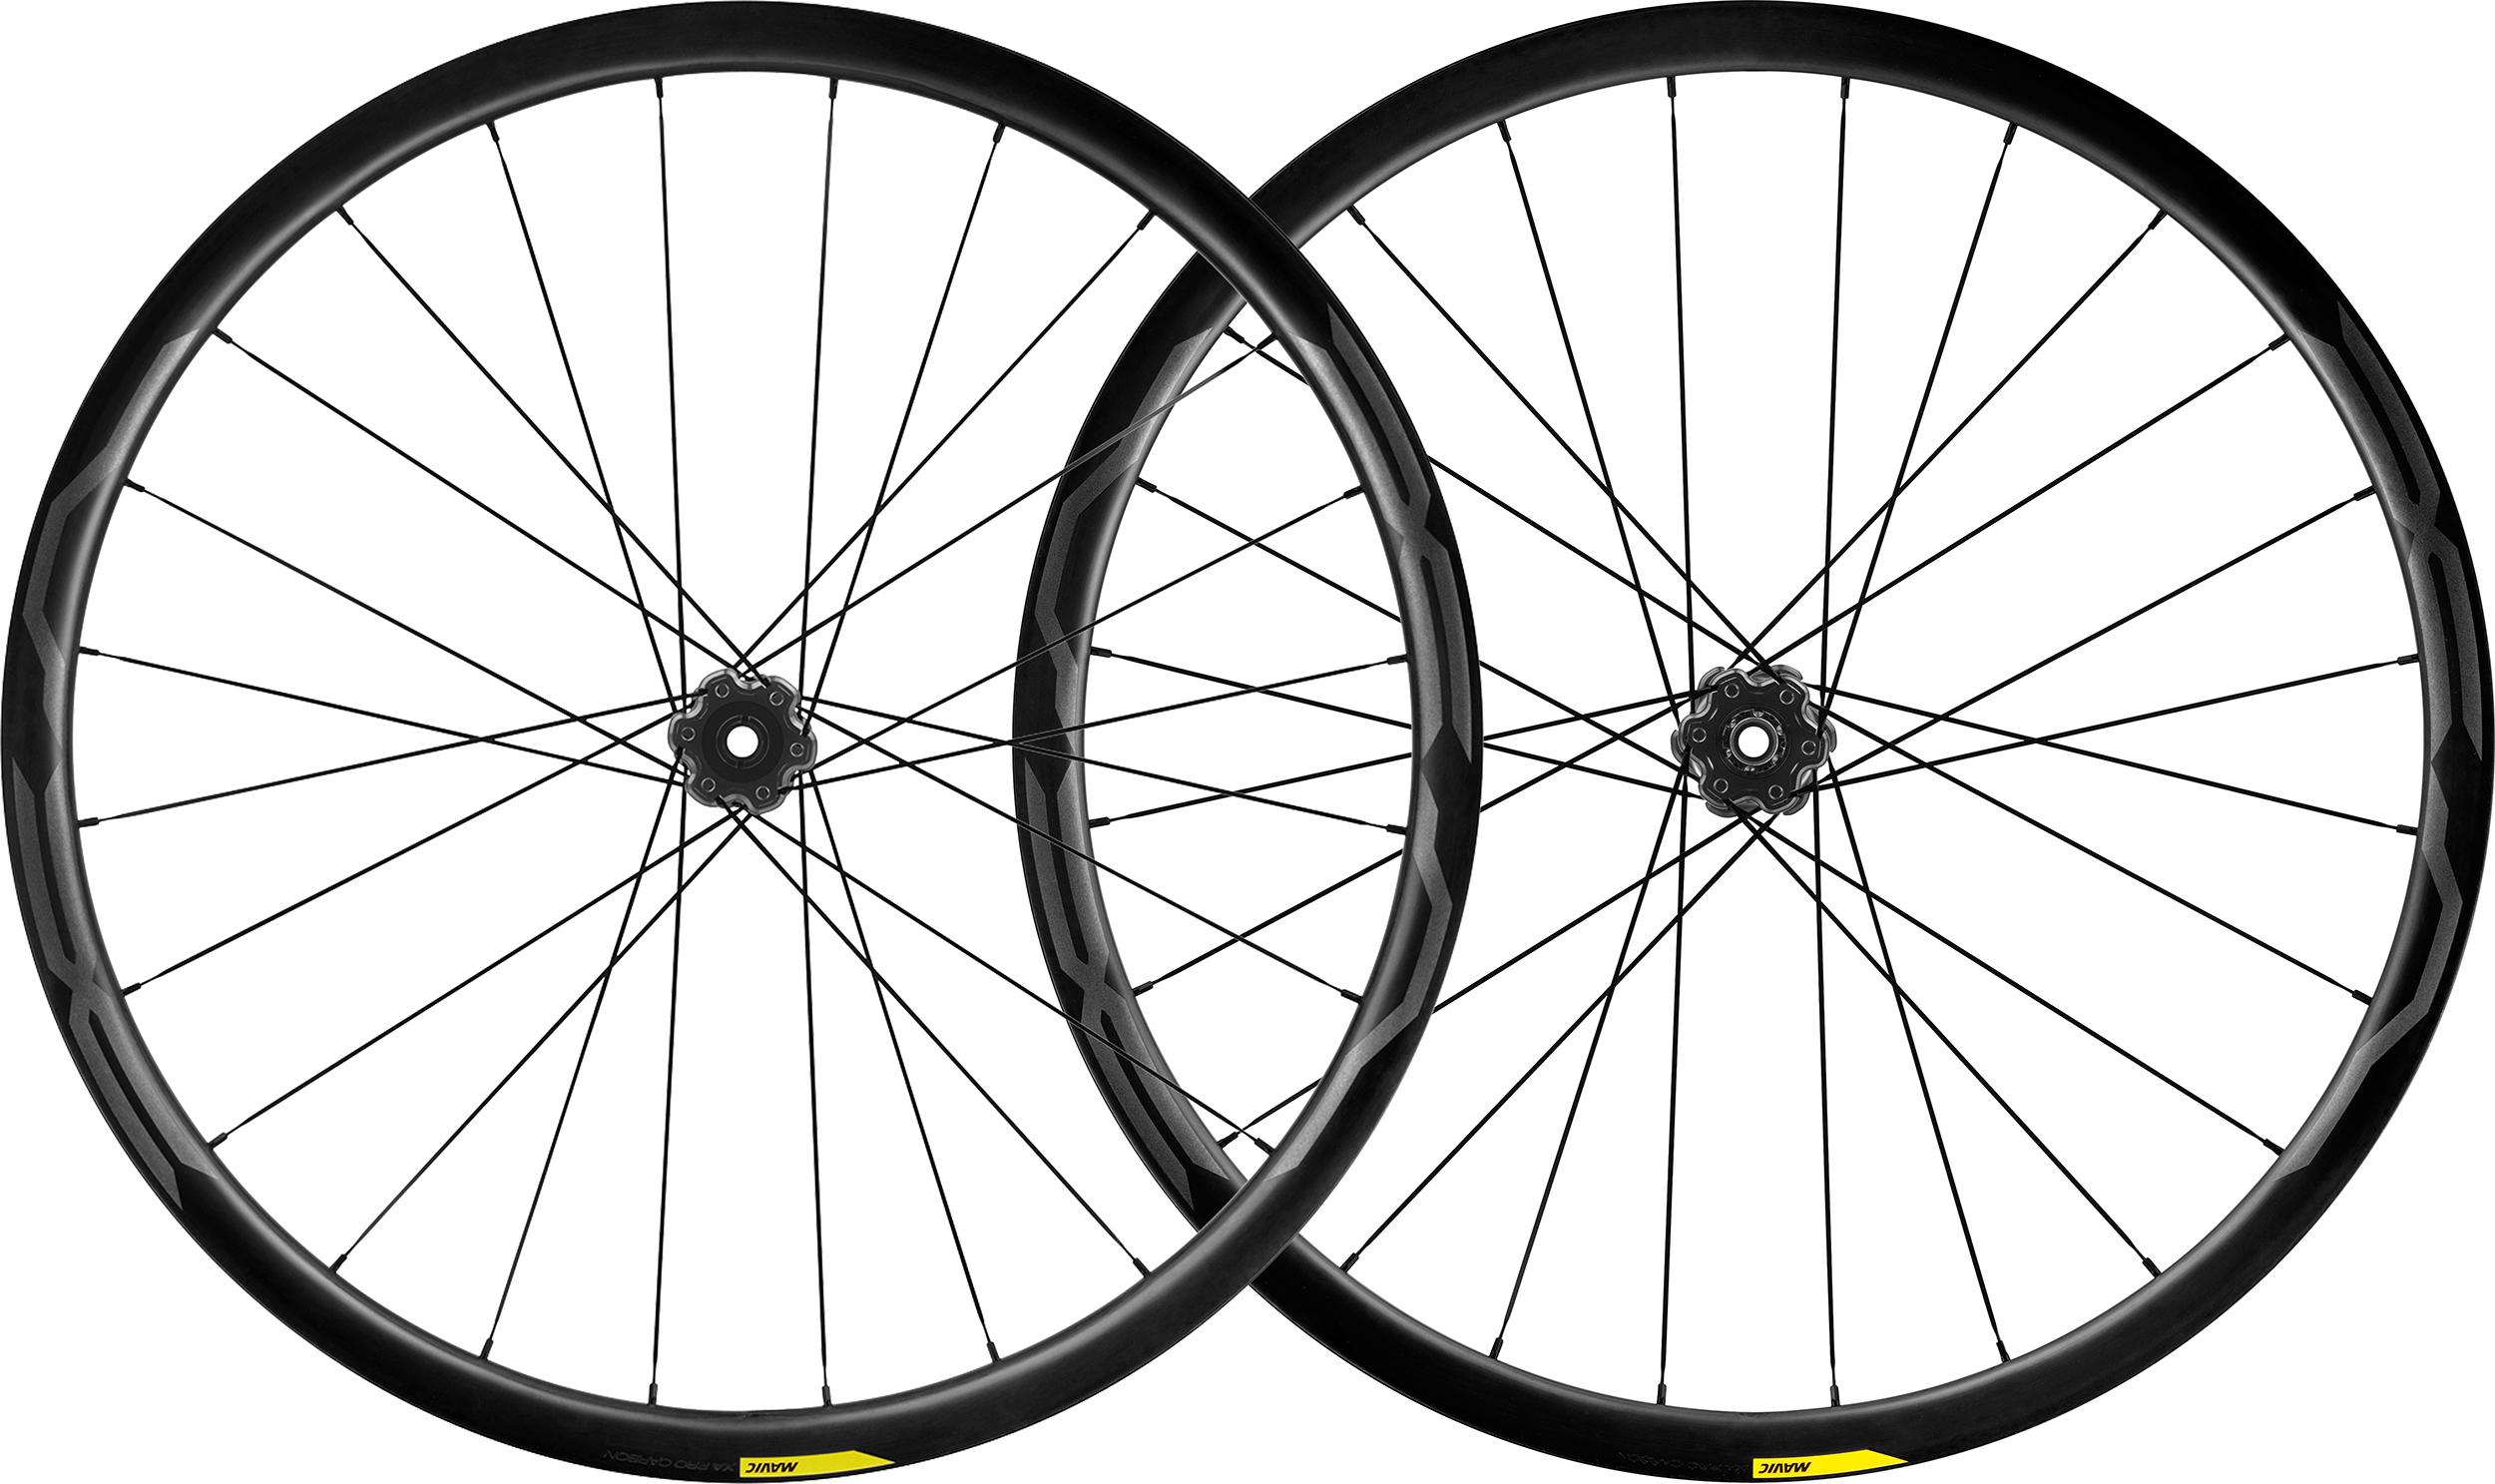 538d741e40f Bike wheels for Mountain biking